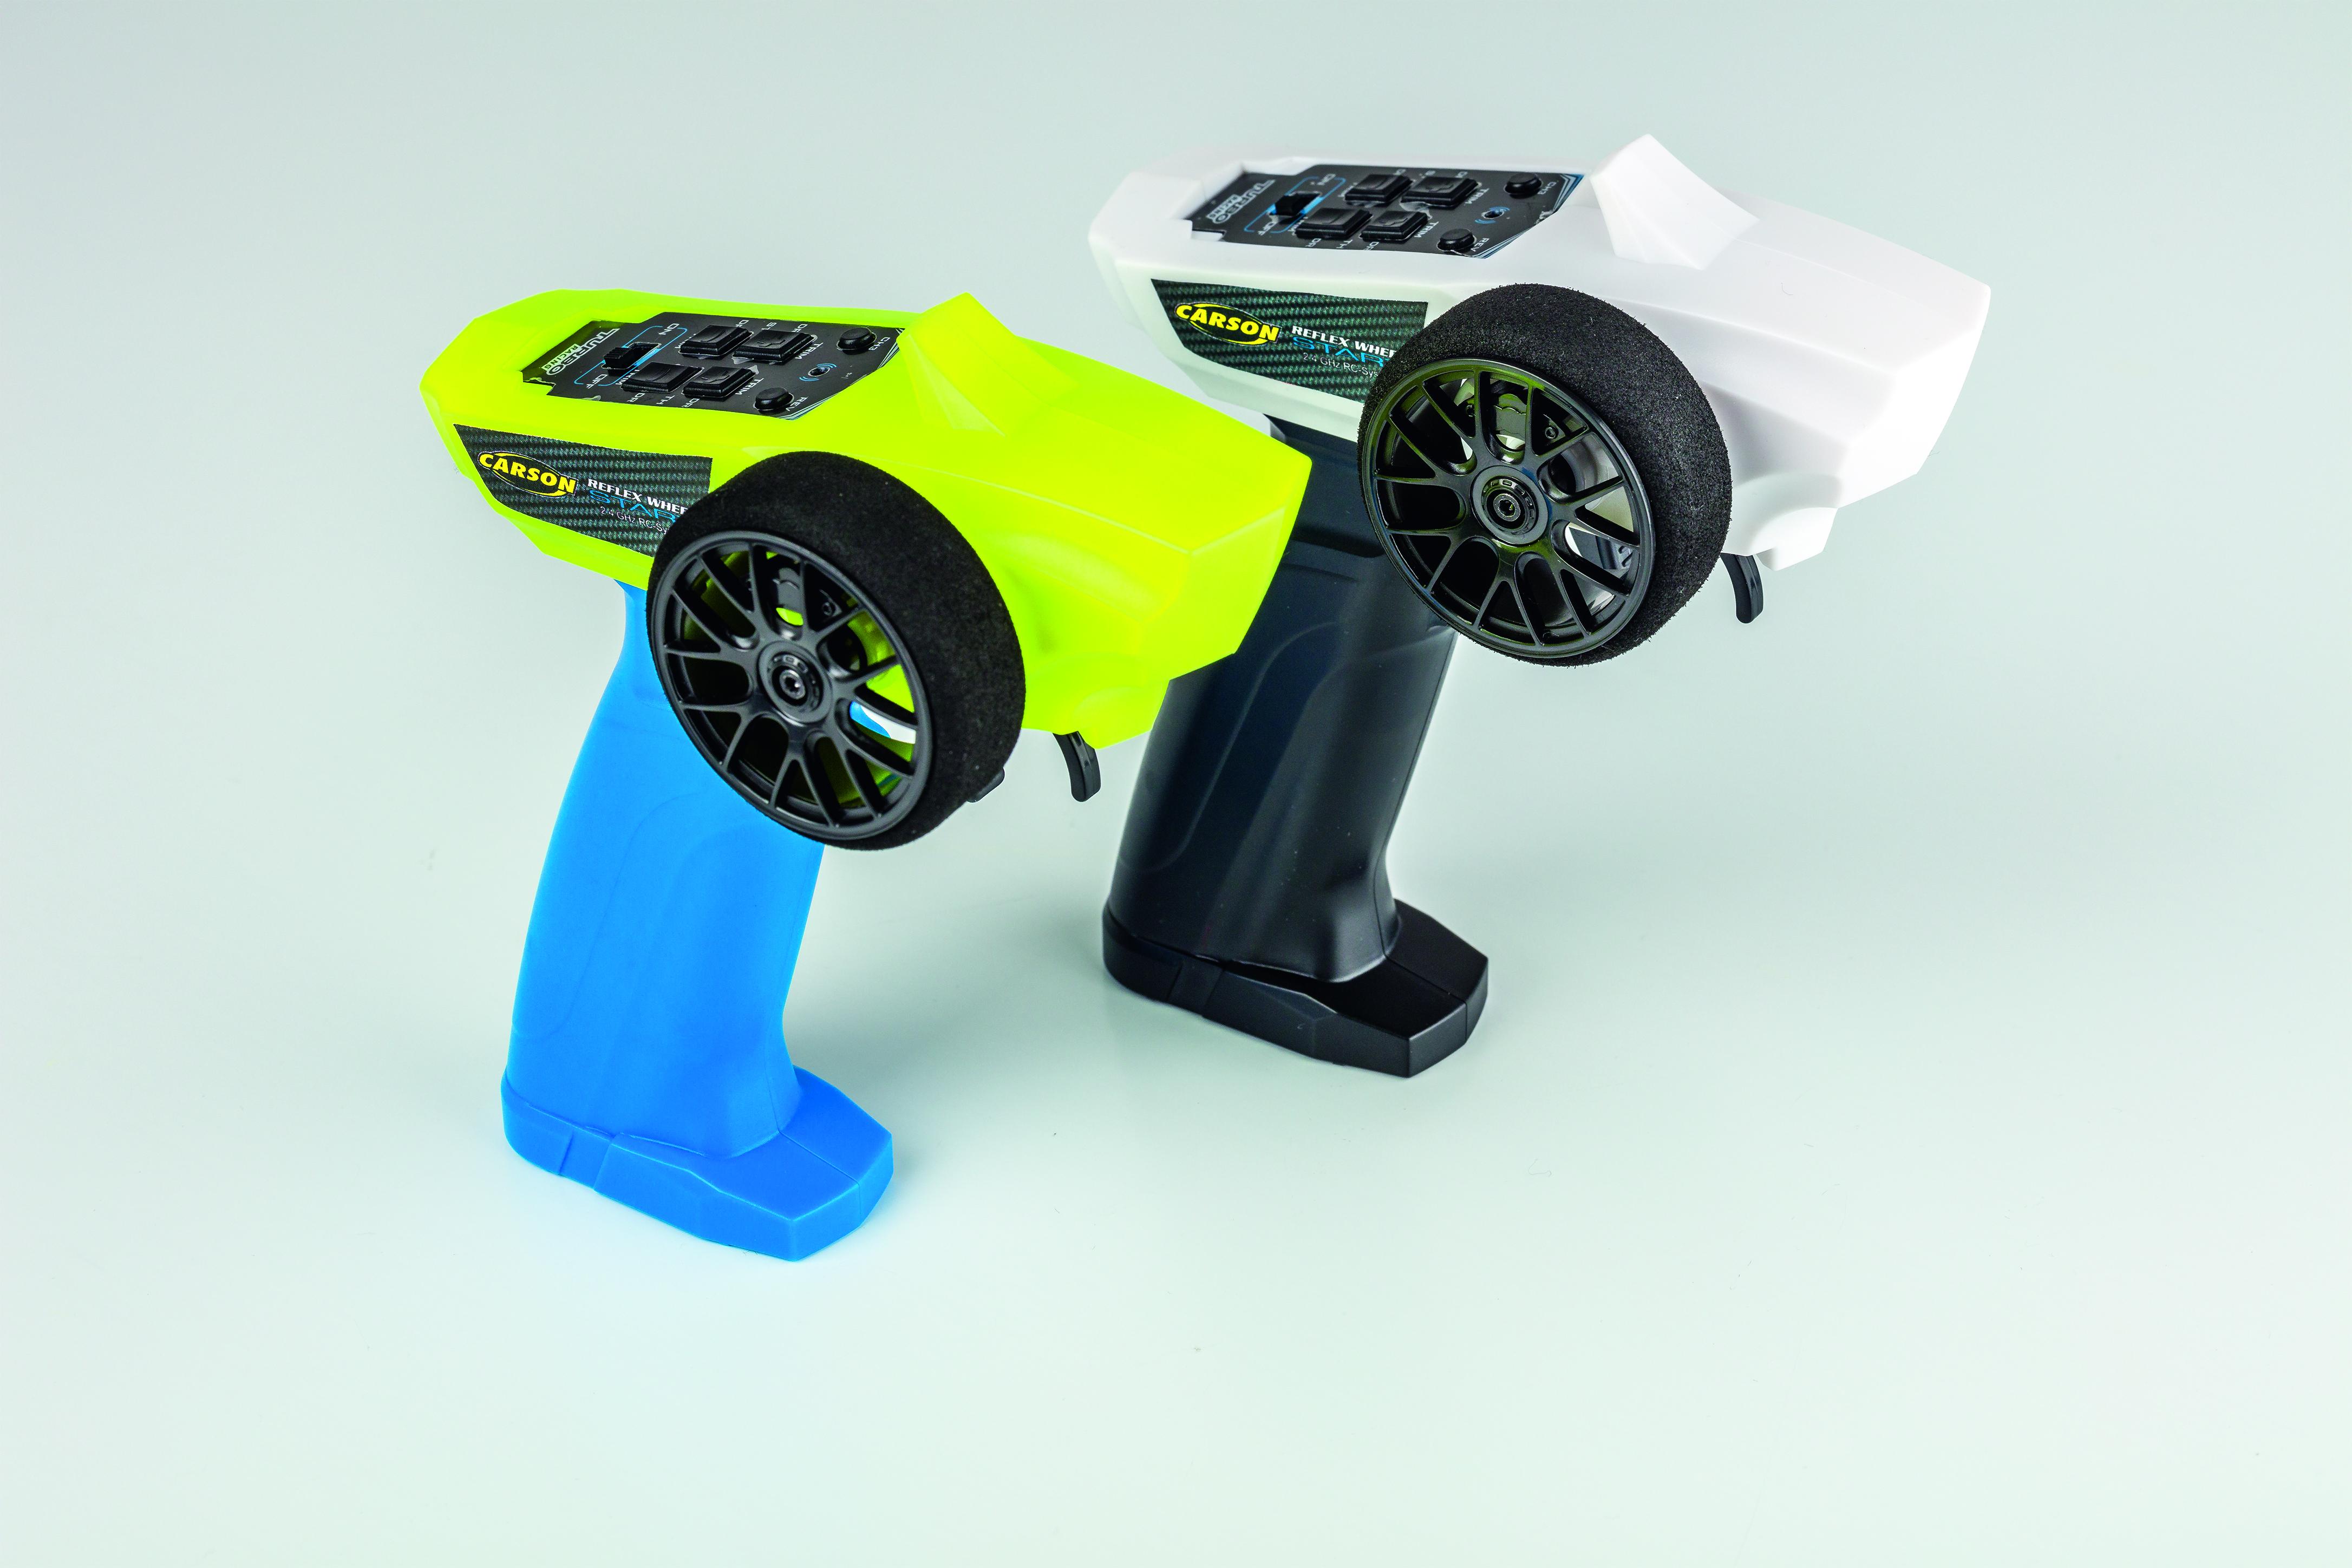 RC souprava CARSON Reflex Wheel Start, 3 Kanál, 2,4GHz, modrý